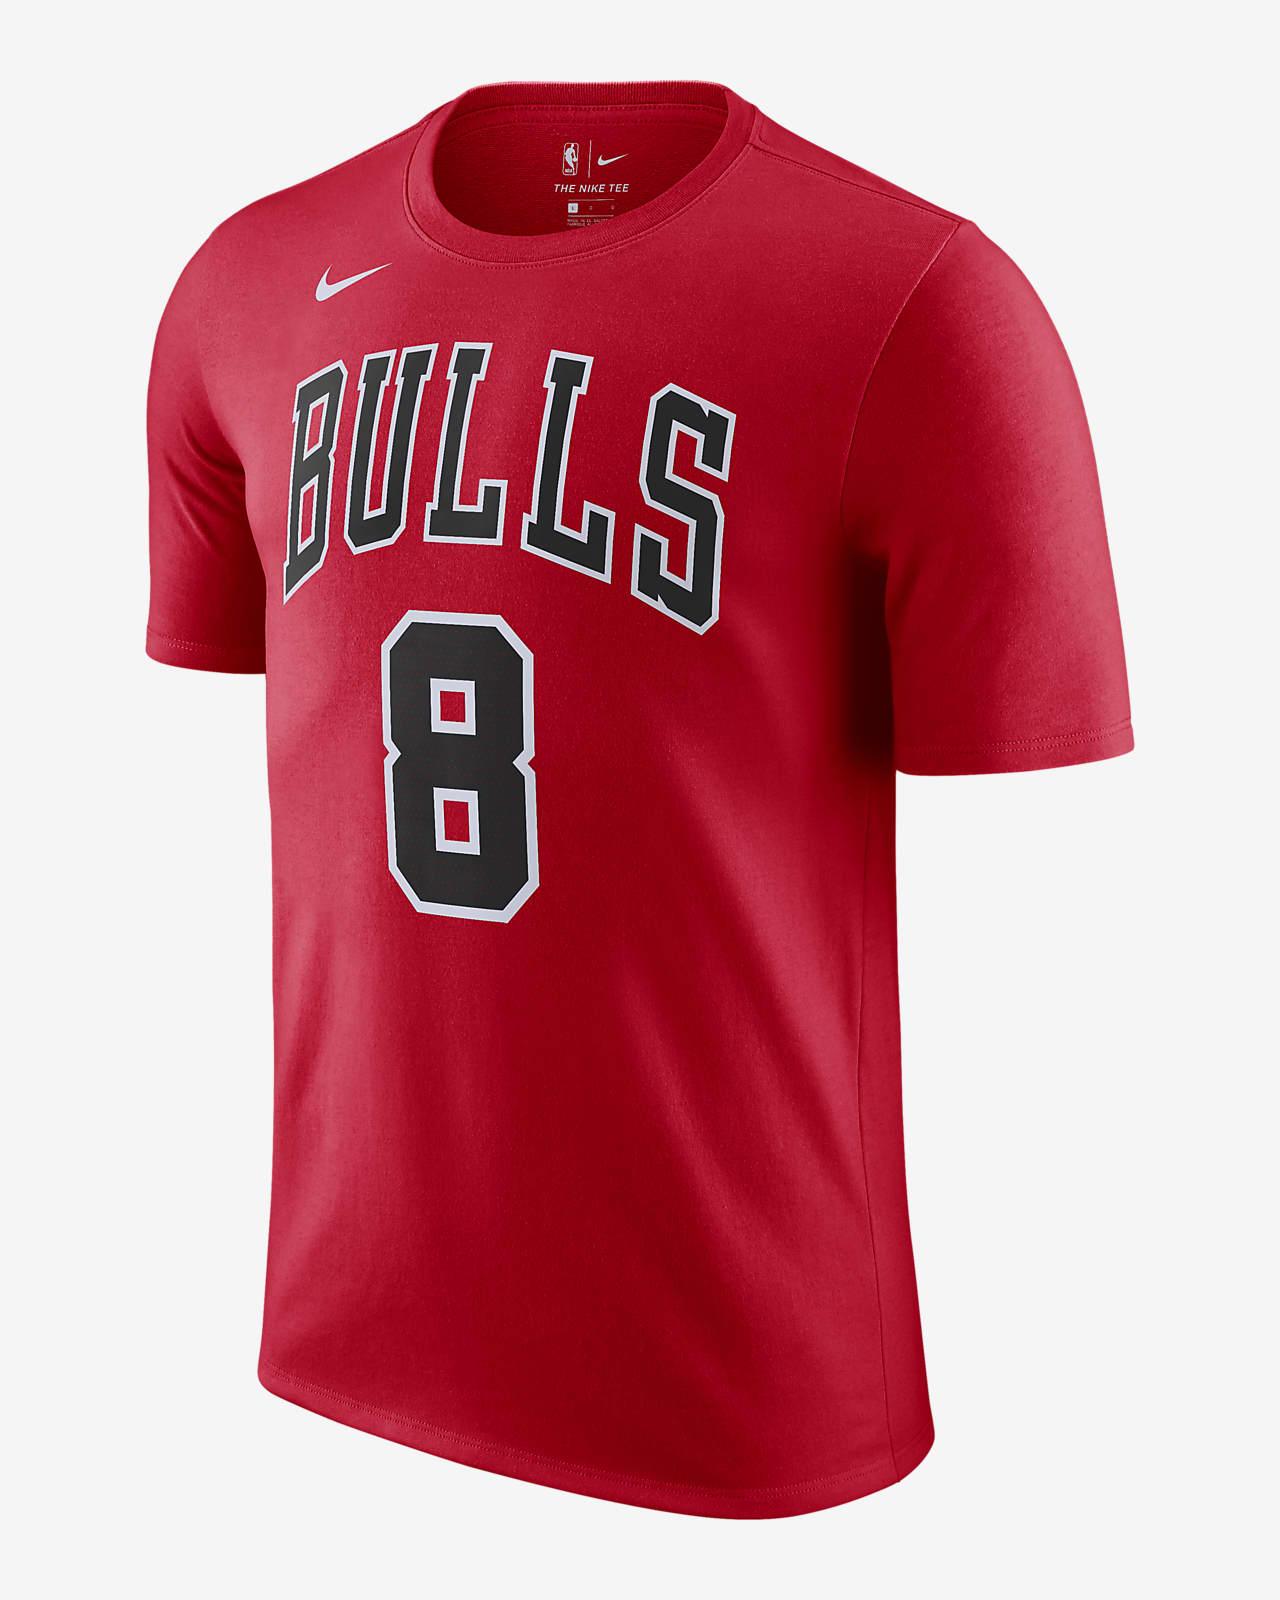 Zach LaVine Bulls Men's Nike NBA T-Shirt